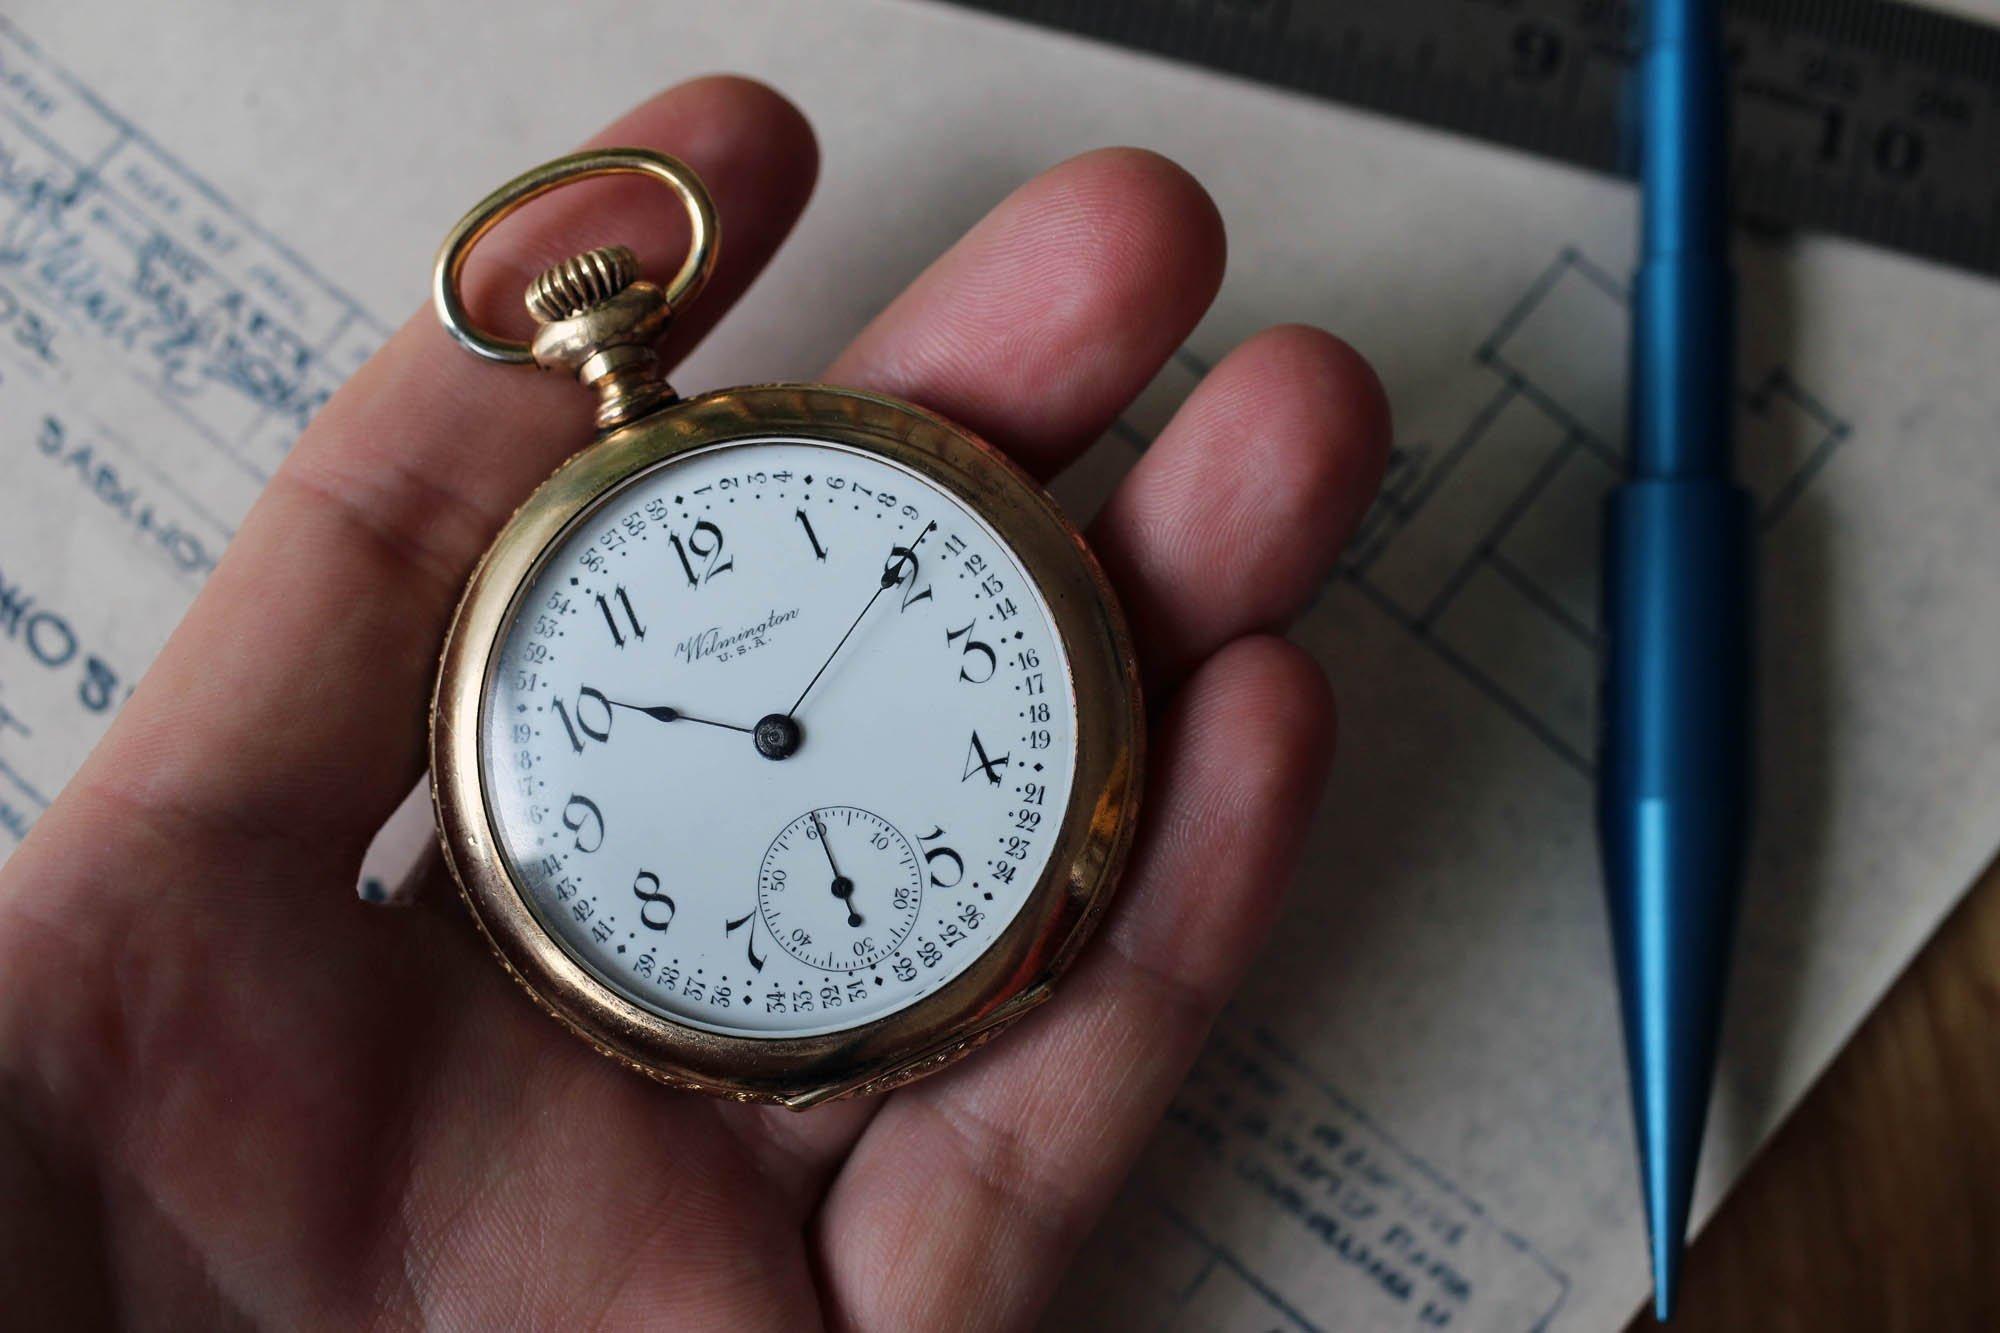 April Vintage Inspiration: Unusual Wilmington Pocket Watch